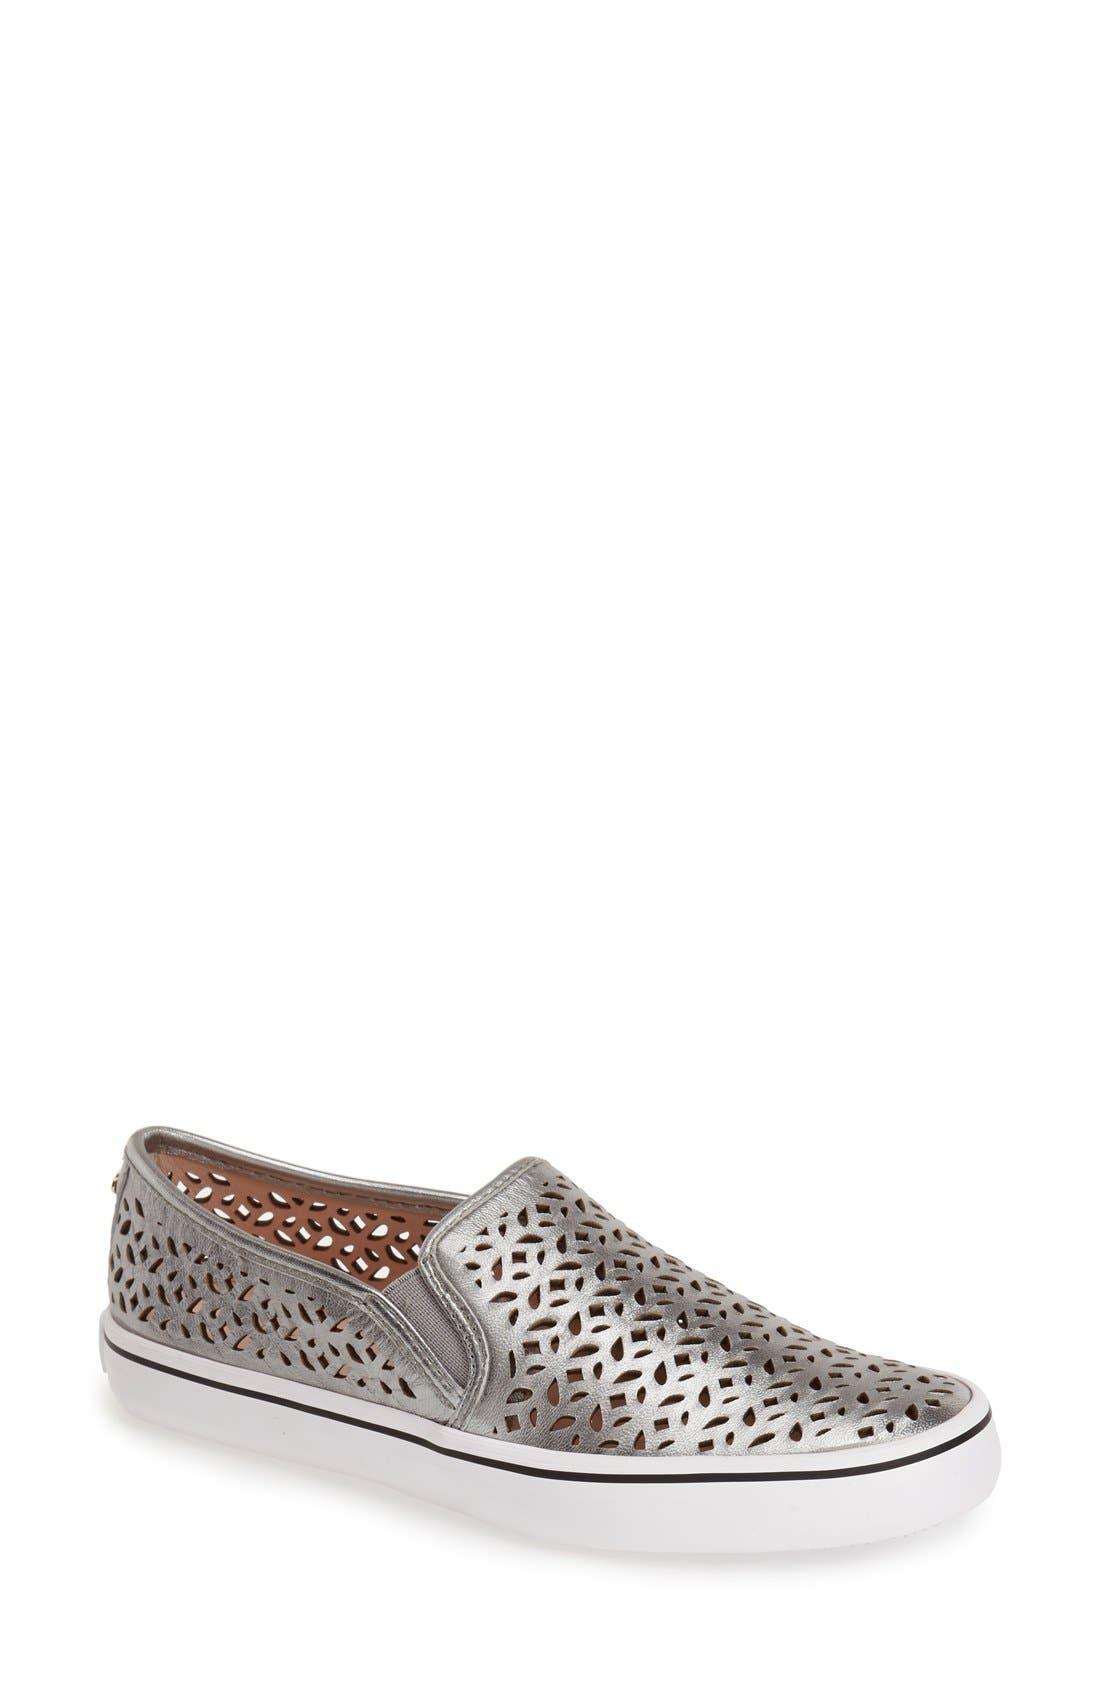 Alternate Image 1 Selected - kate spade new york 'saddie' slip-on sneaker (Women)